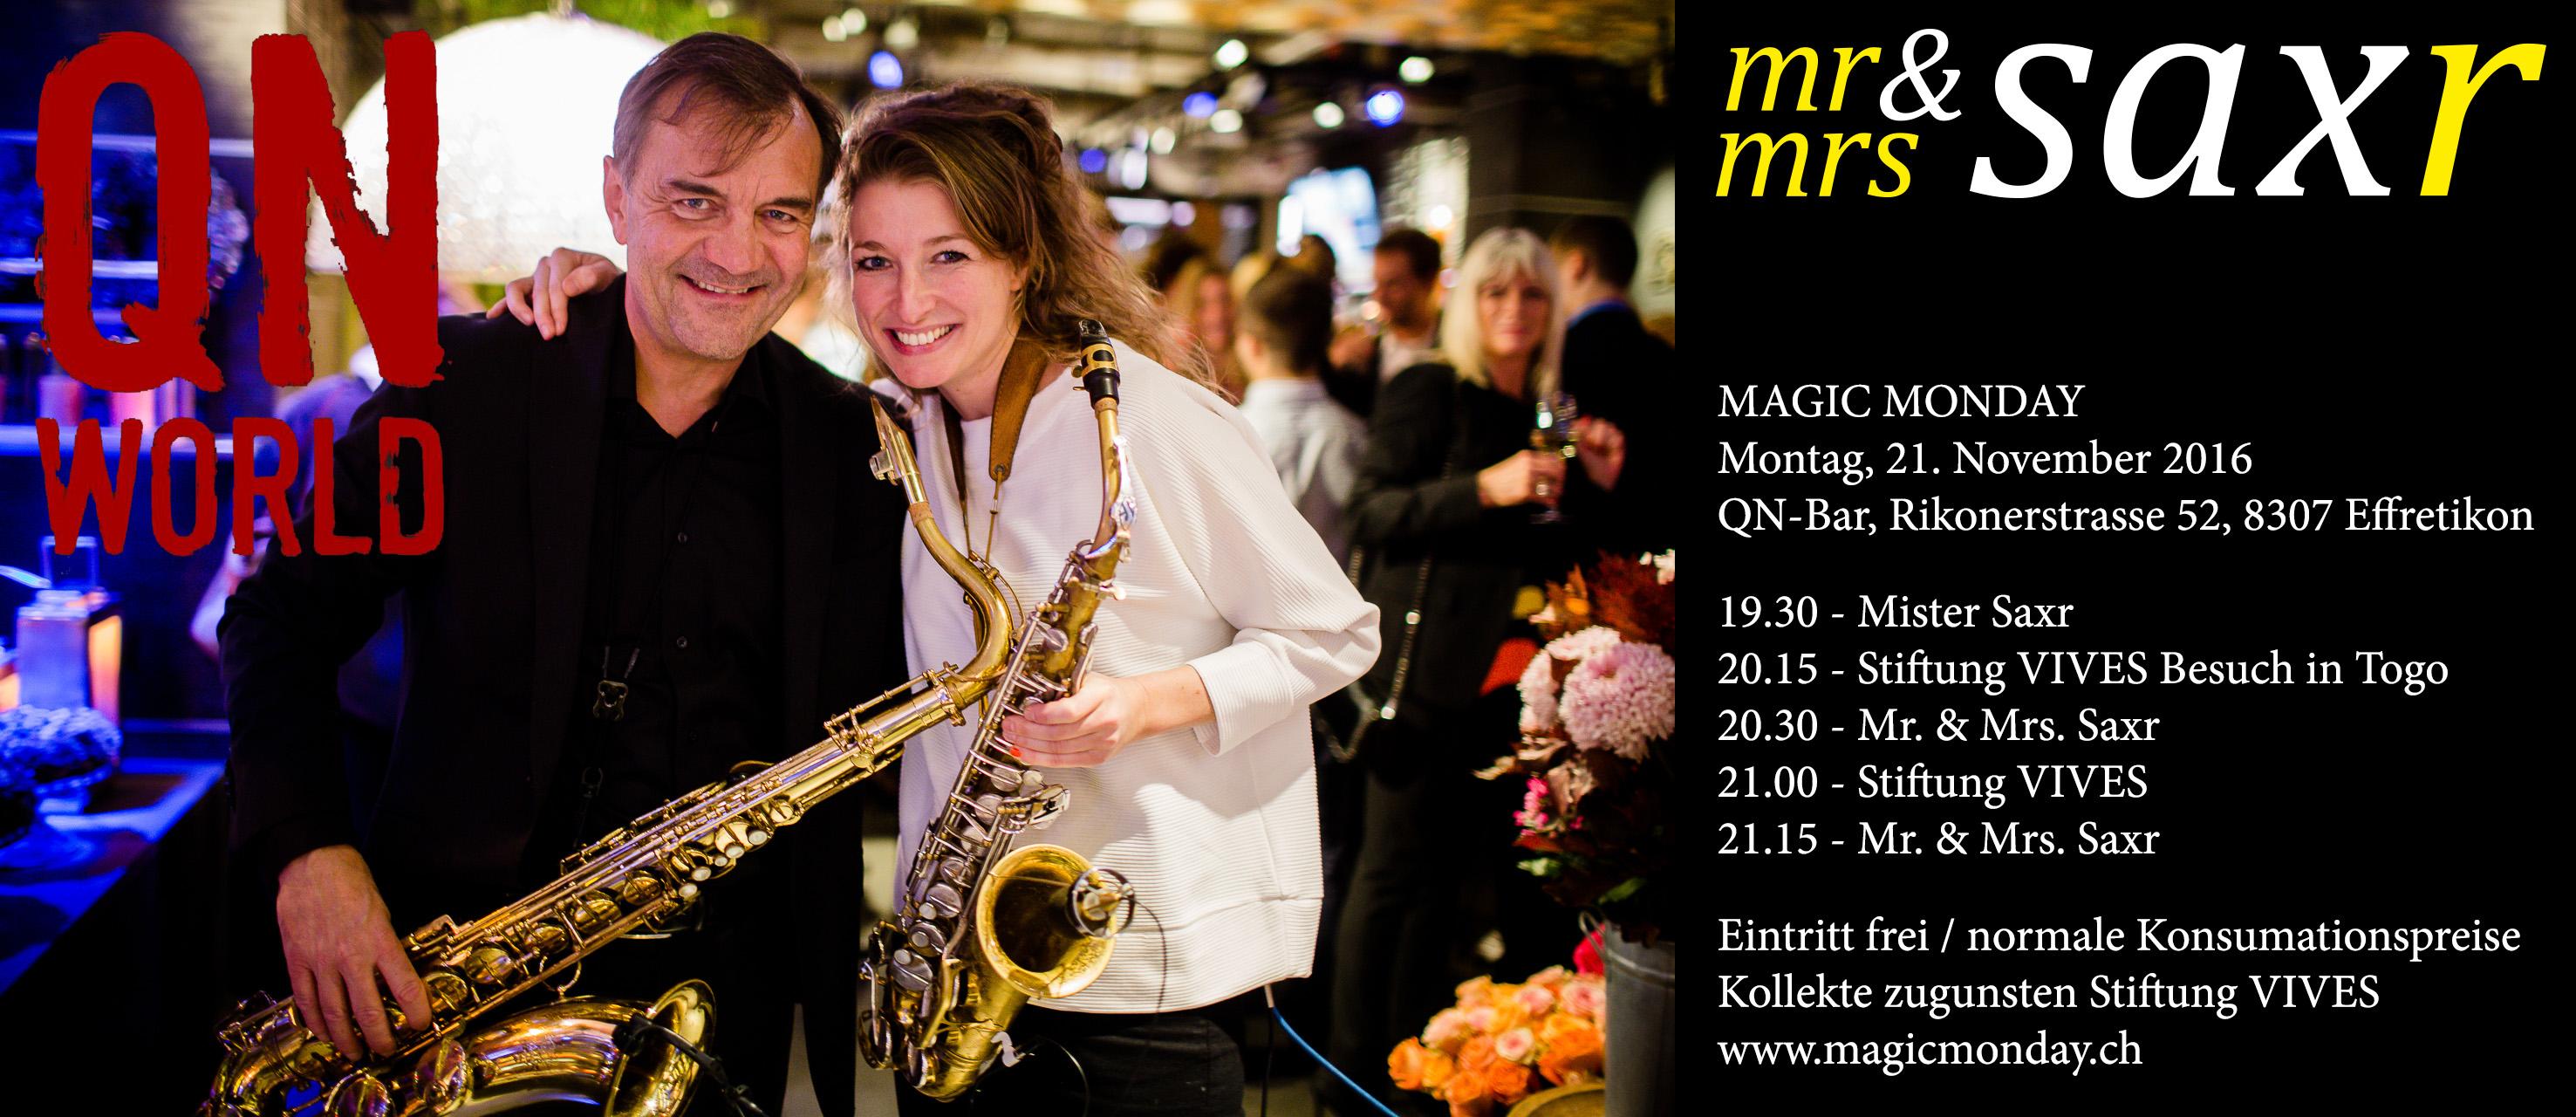 live Saxophonist - Saxophon Bossa Nova Jazz-Standards Pop-Klassiker Lovesongs bis zu Disco-Krachern Mister Saxr erfüllt als Live Saxofonist Musikwünsche